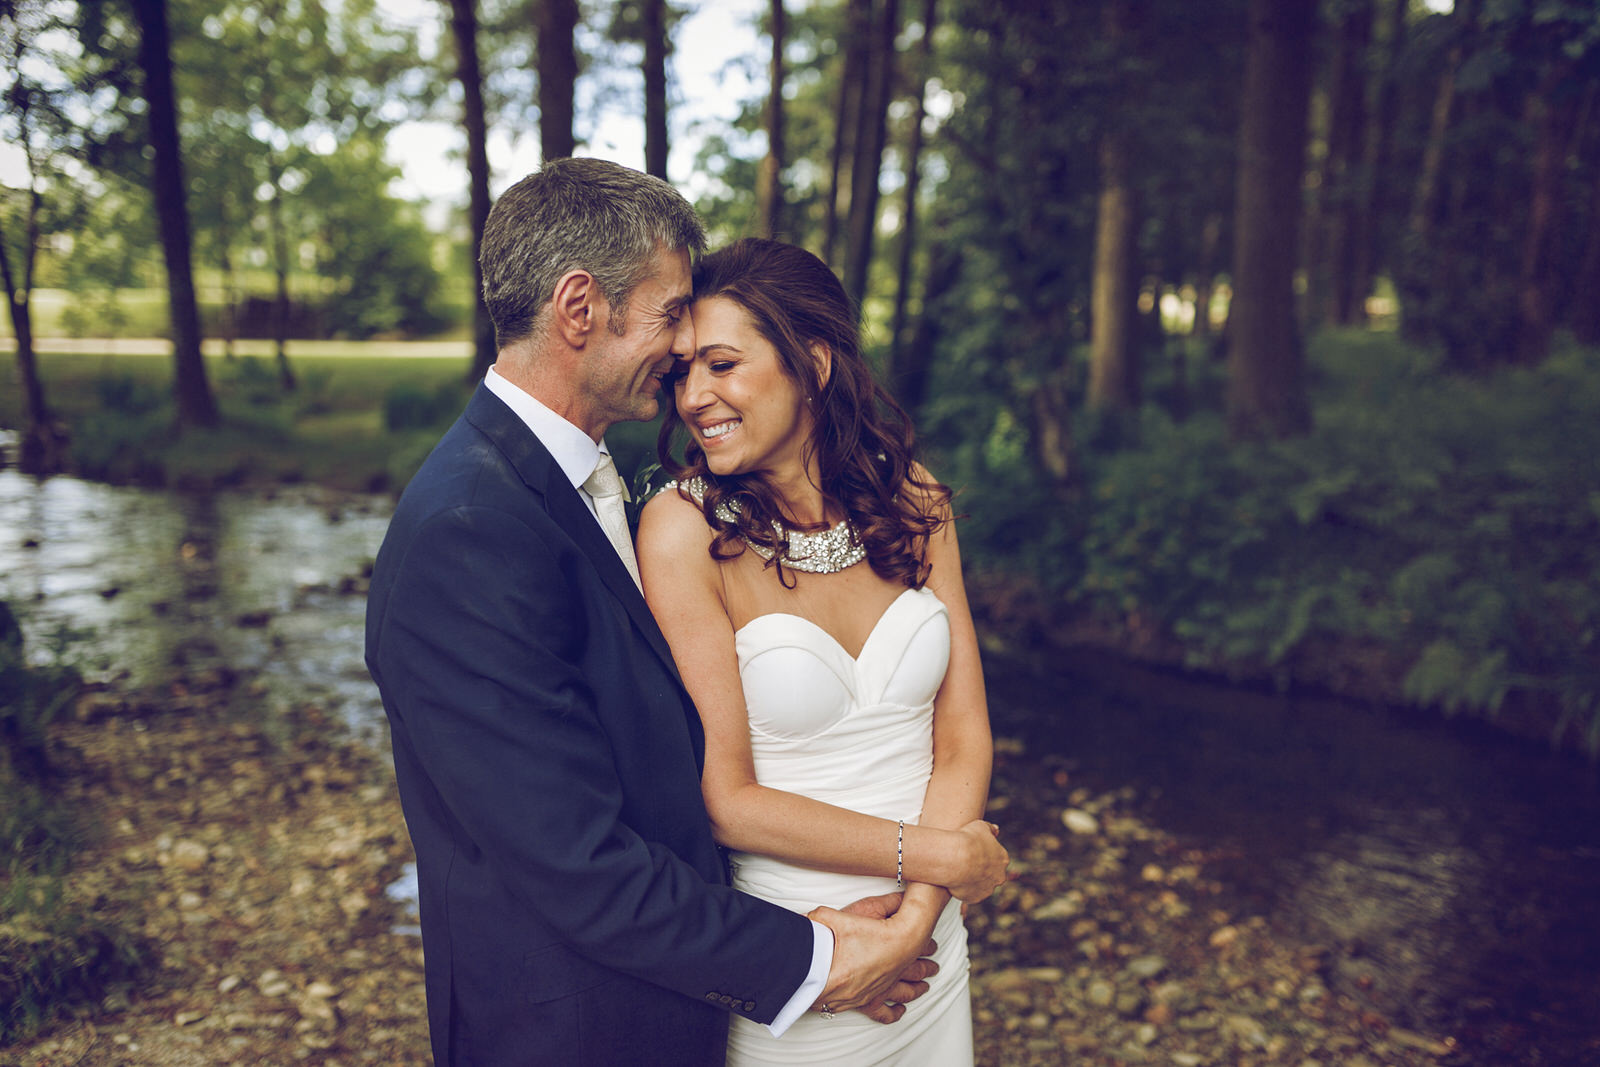 Brooklodge-wicklow-wedding-photographer_079.jpg